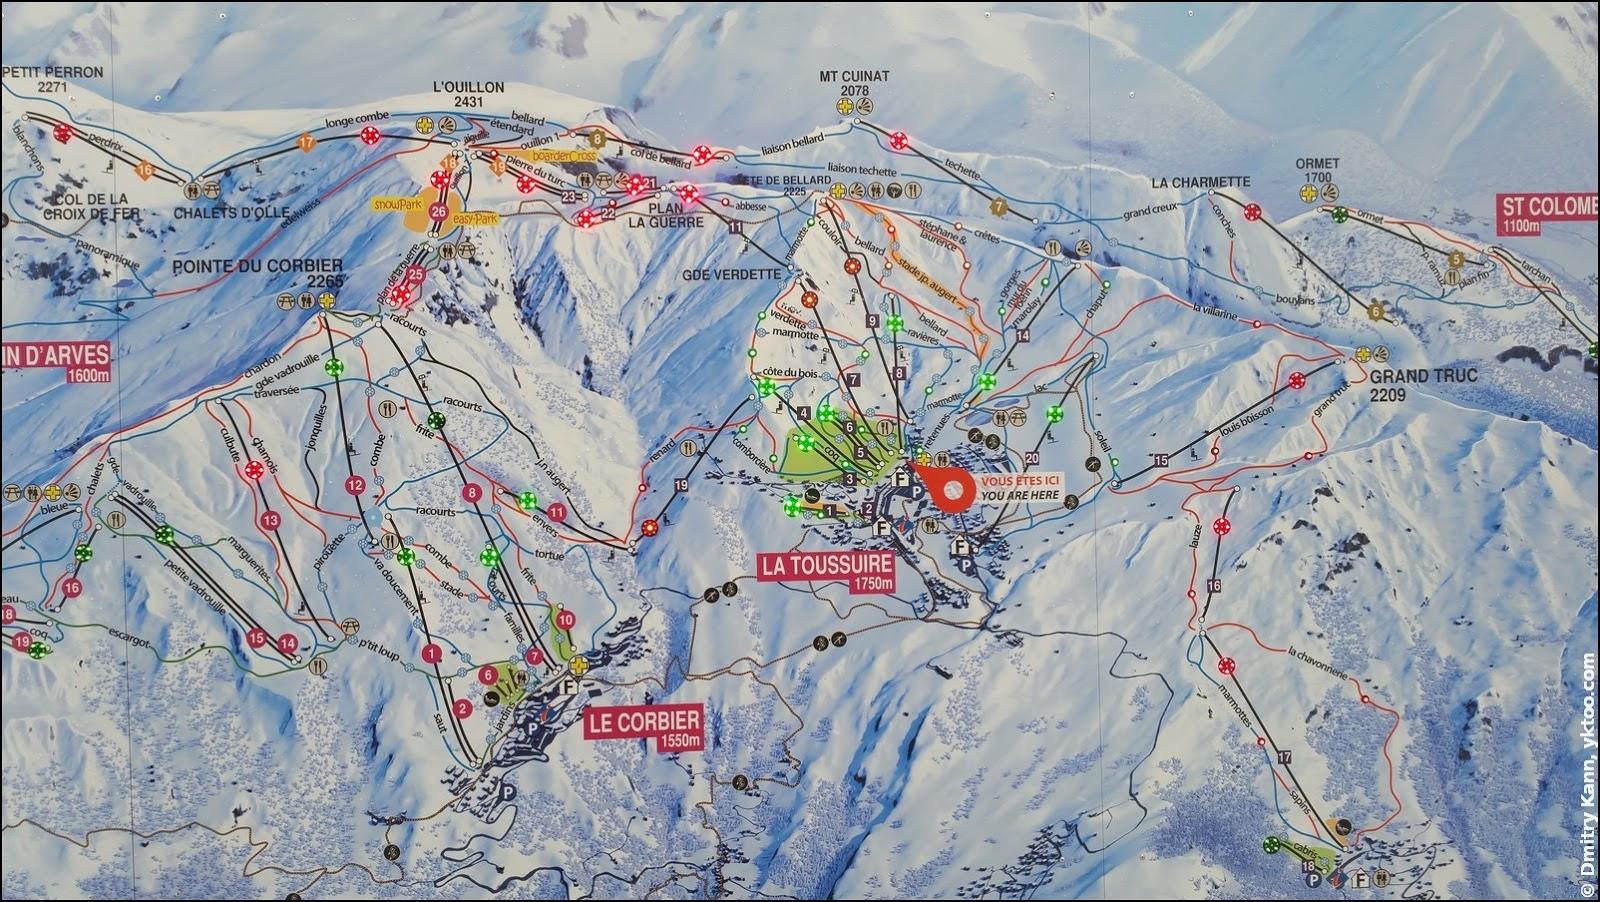 Interactive ski map.